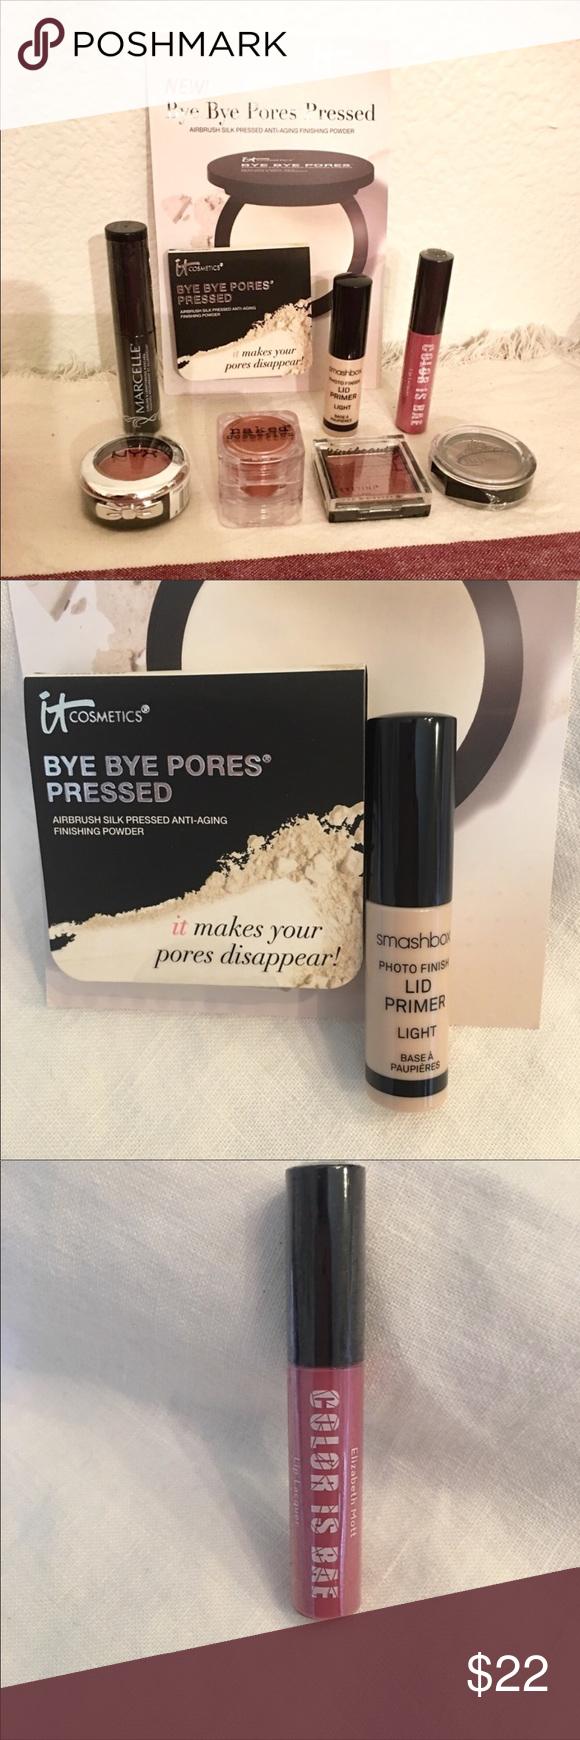 Ipsy Makeup Bundle Smashbox iT cosmetics NYX NWT (With